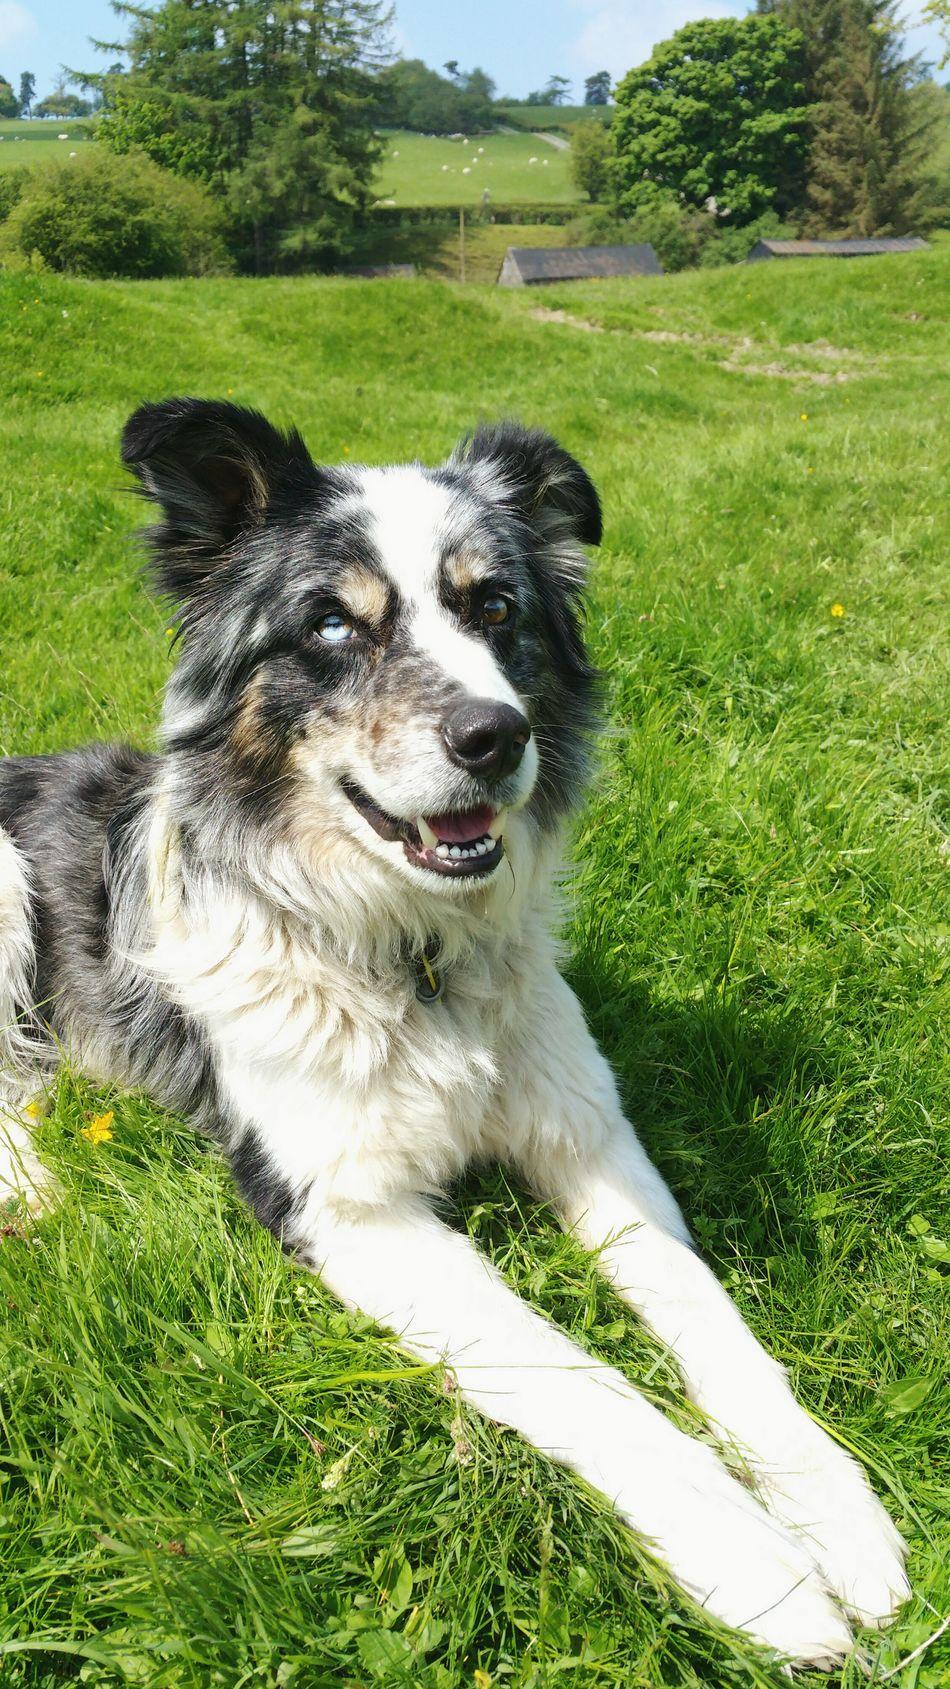 A new friend. .. Sheepdog Dog Farm Wales Animals Animal Countryside Farm Life Grass Fields Fieldscape овчарка собака поле